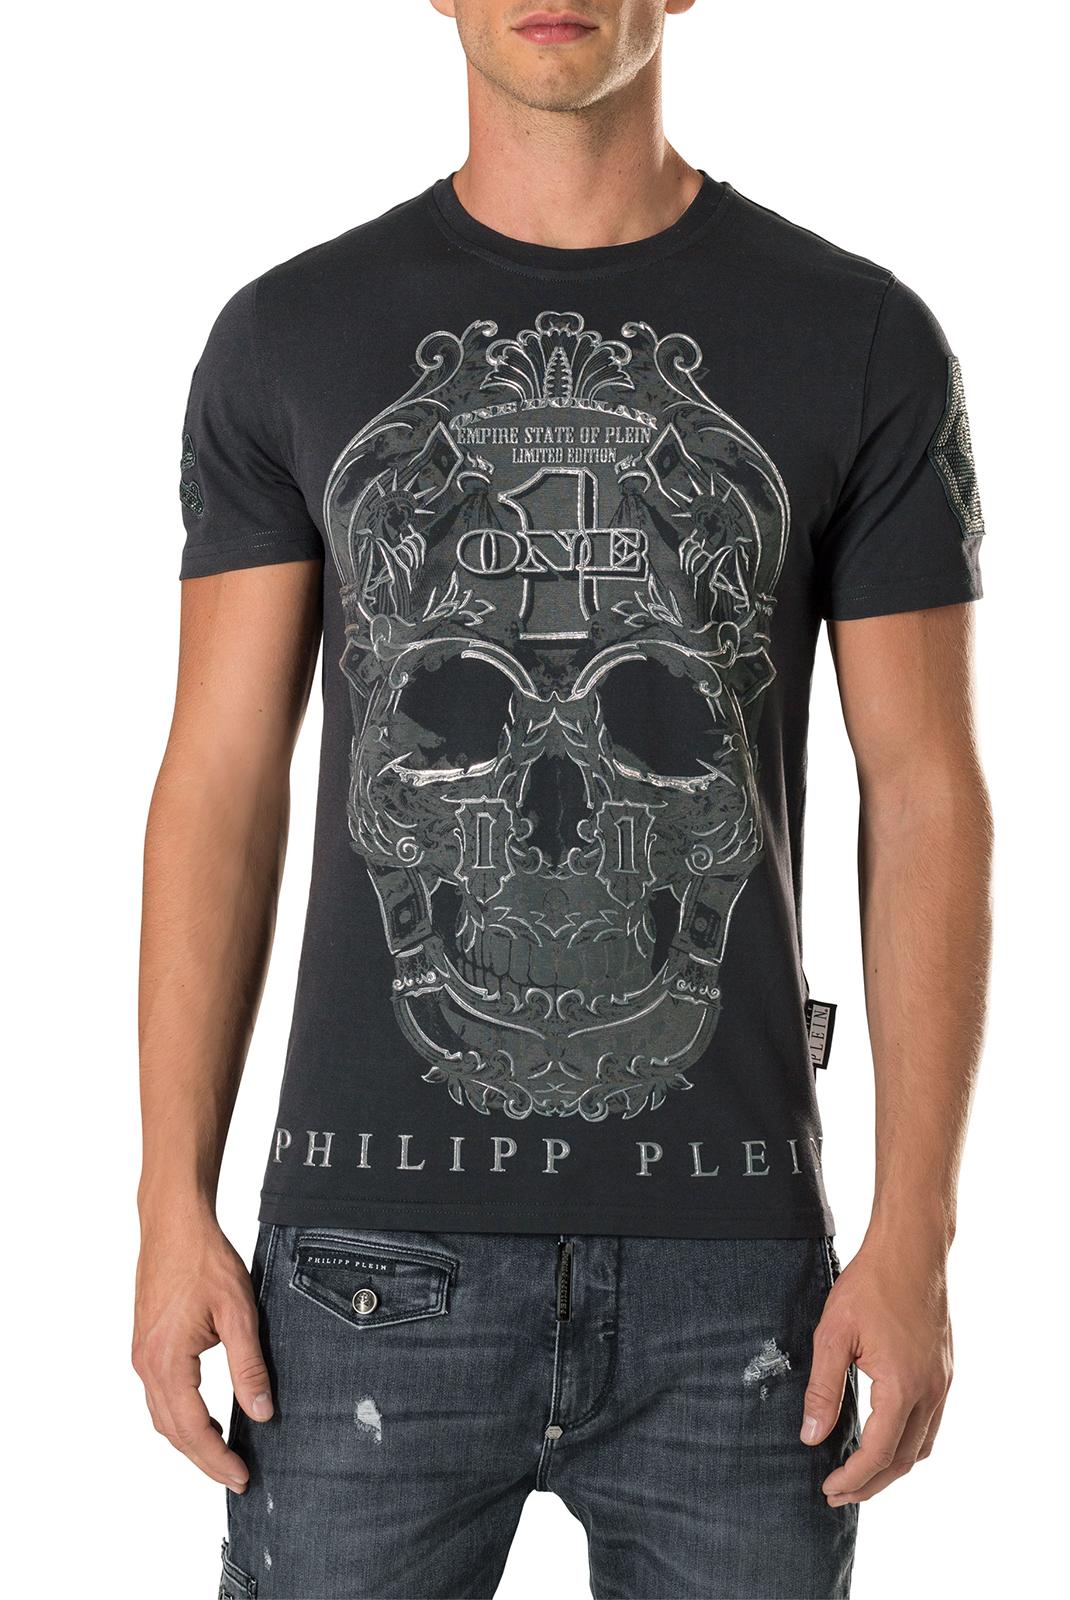 Tee-shirts  Philipp plein MTK1400 PLAY 02 BLACK